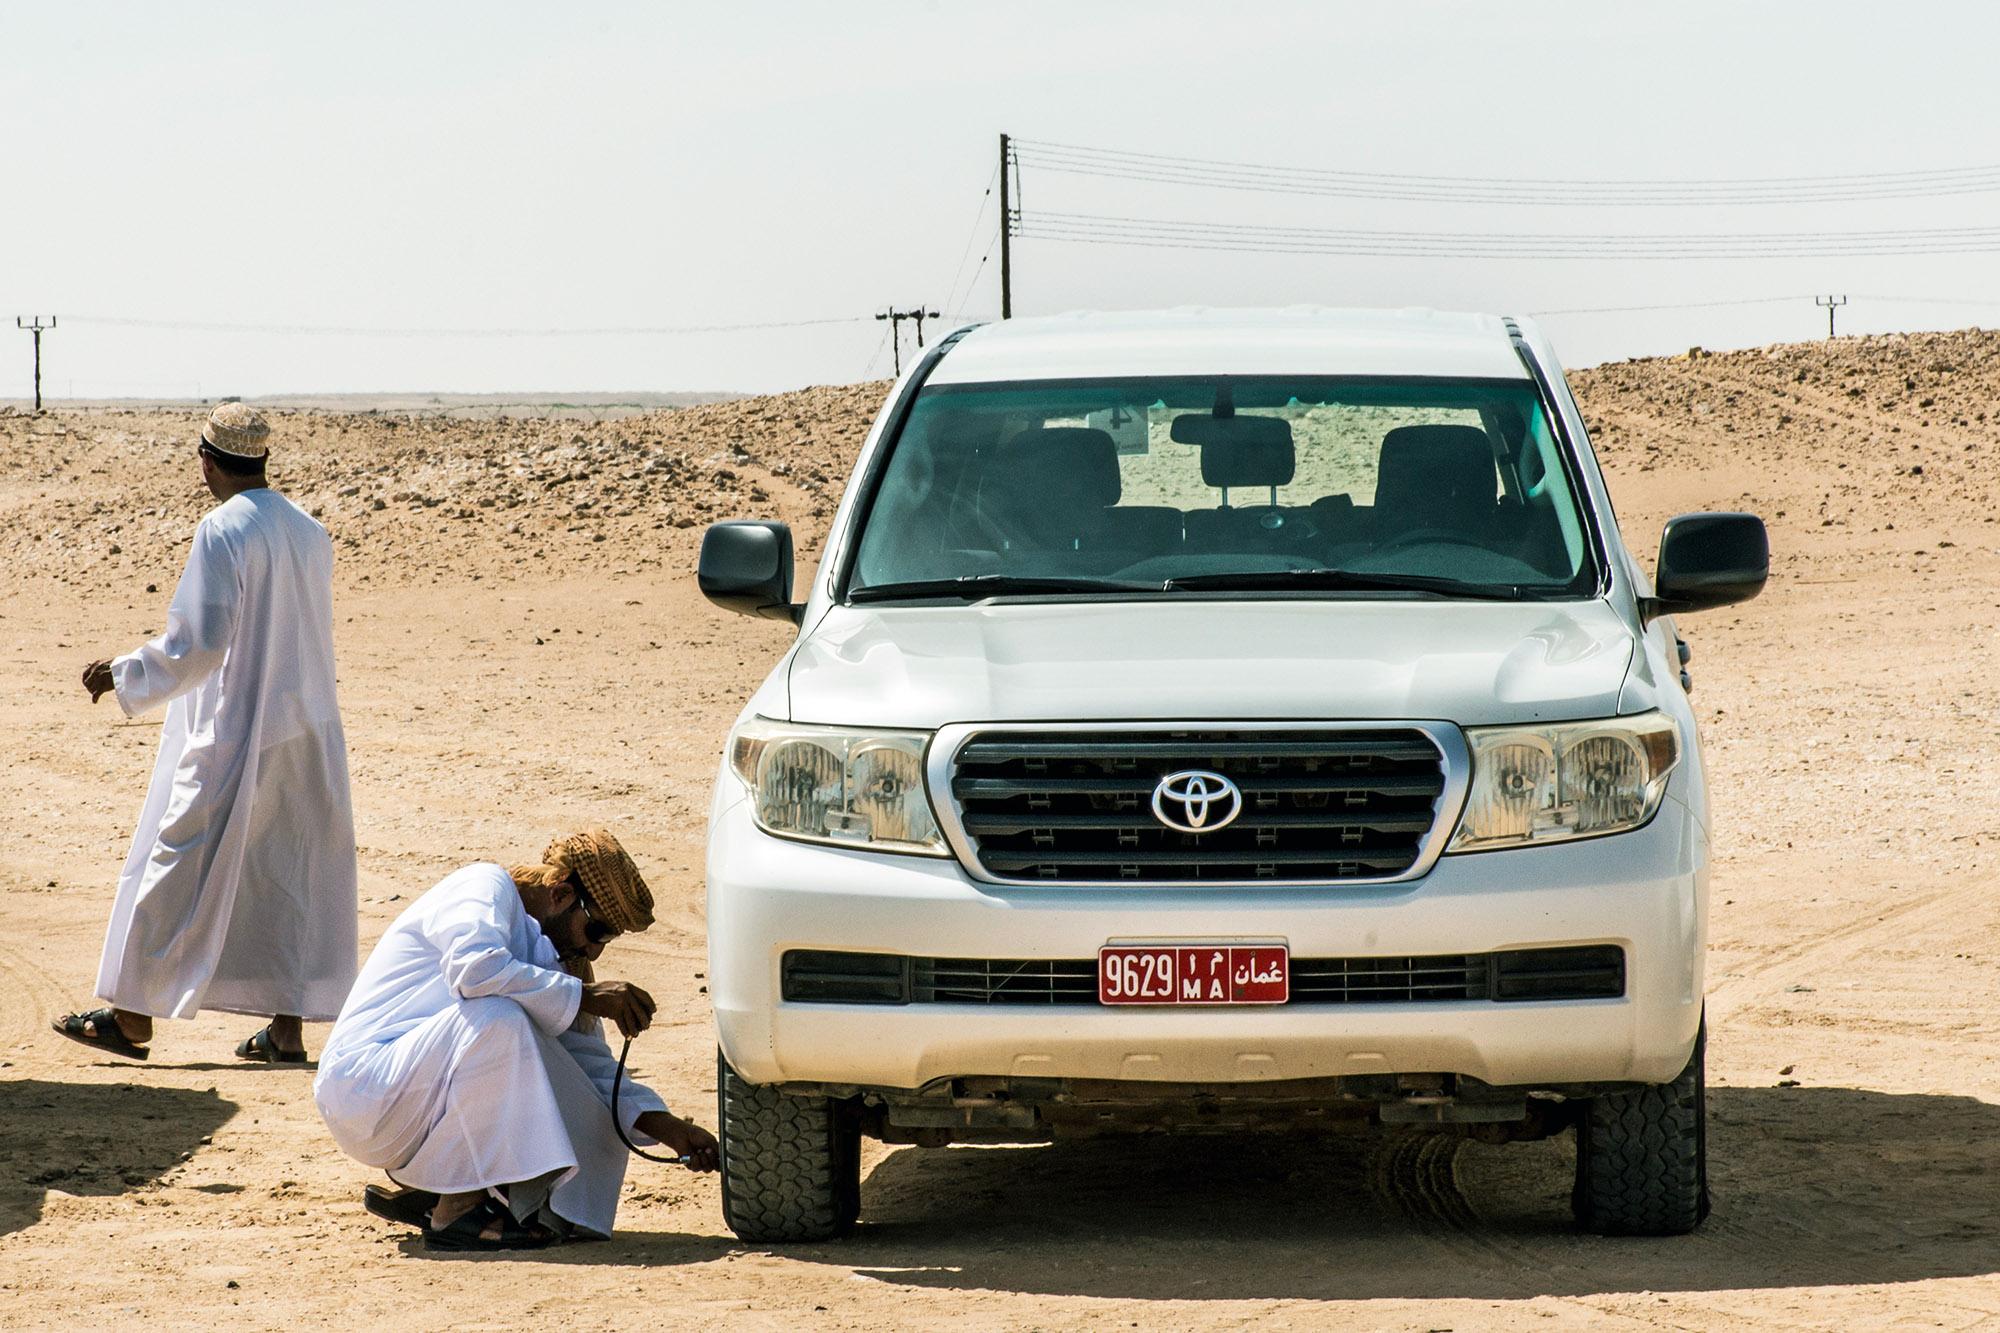 Oman Salalah 17.10.2016 Jeep traditional Safari Dune Bashing Oman Ubar Desert Rub al Khali Local arab people during Tour dhofar Sultanate